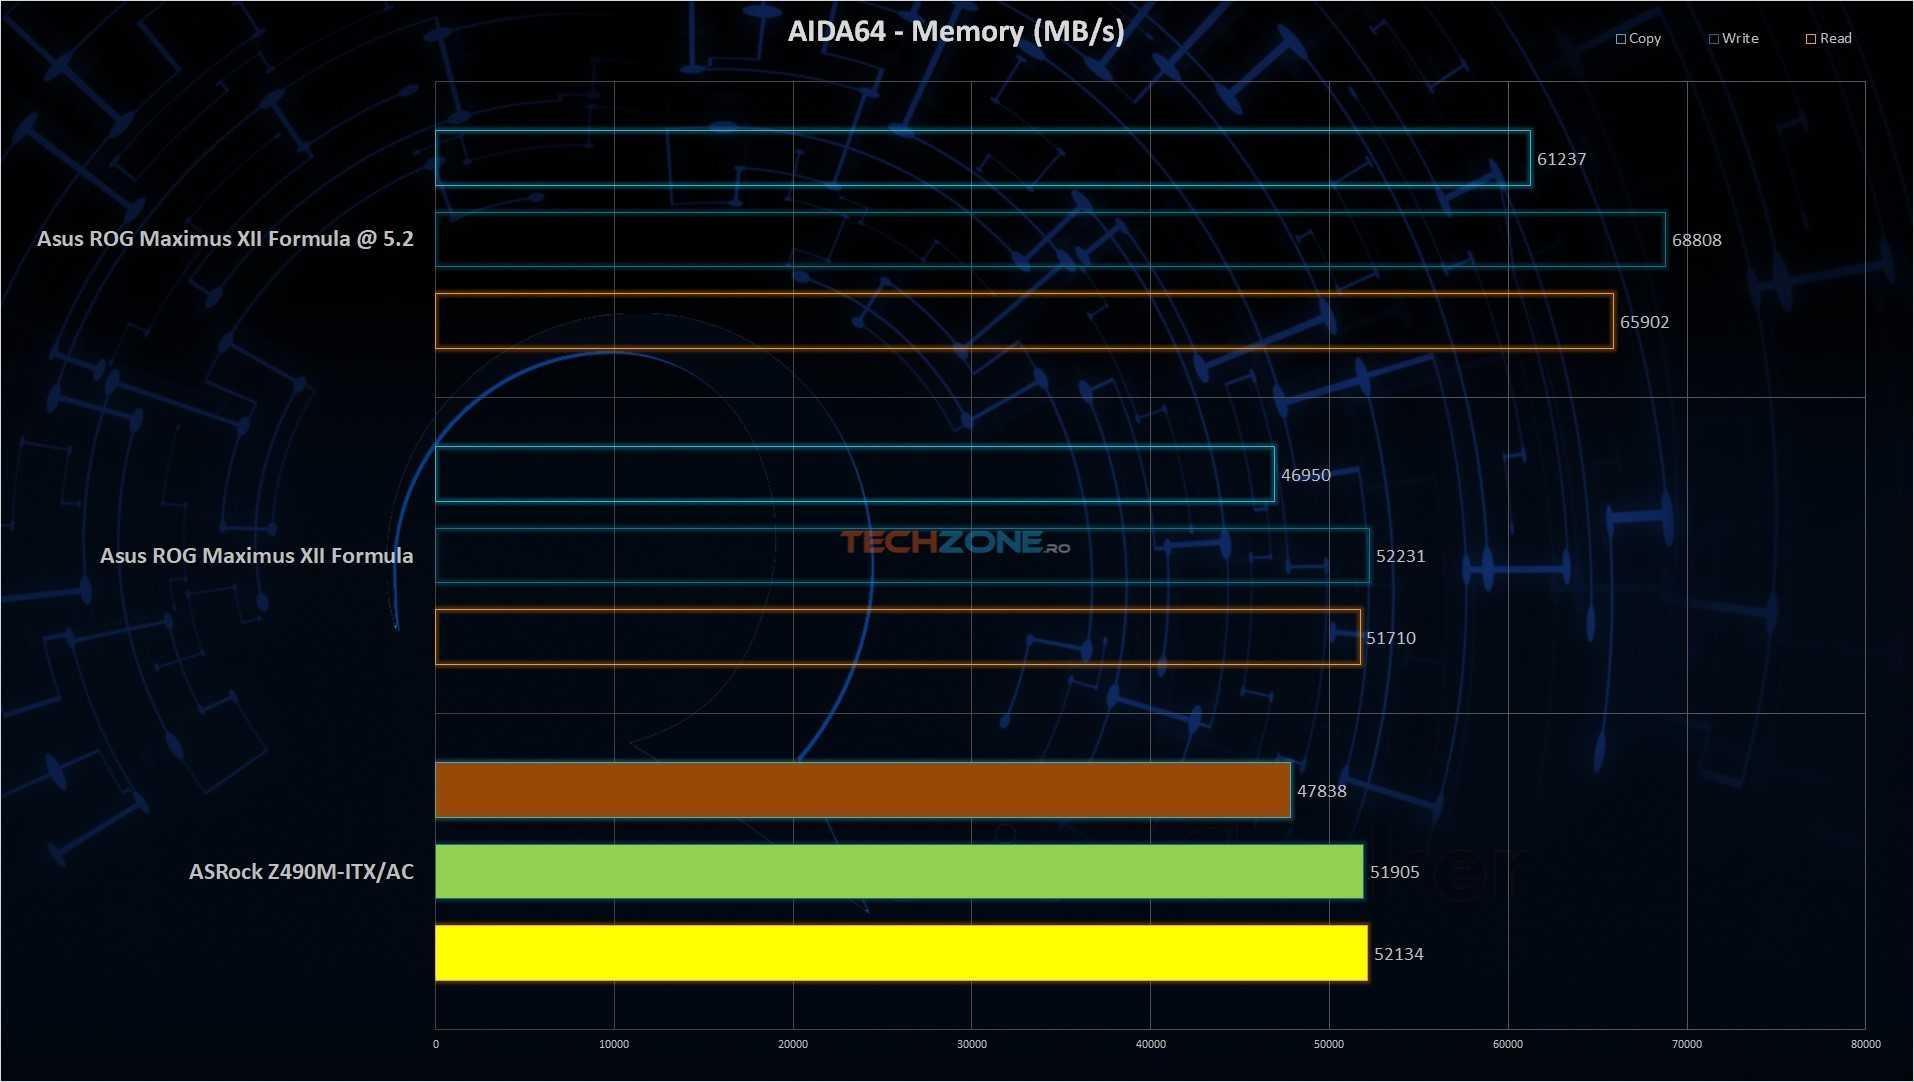 ASRock Z490m ITX AIDA RAM